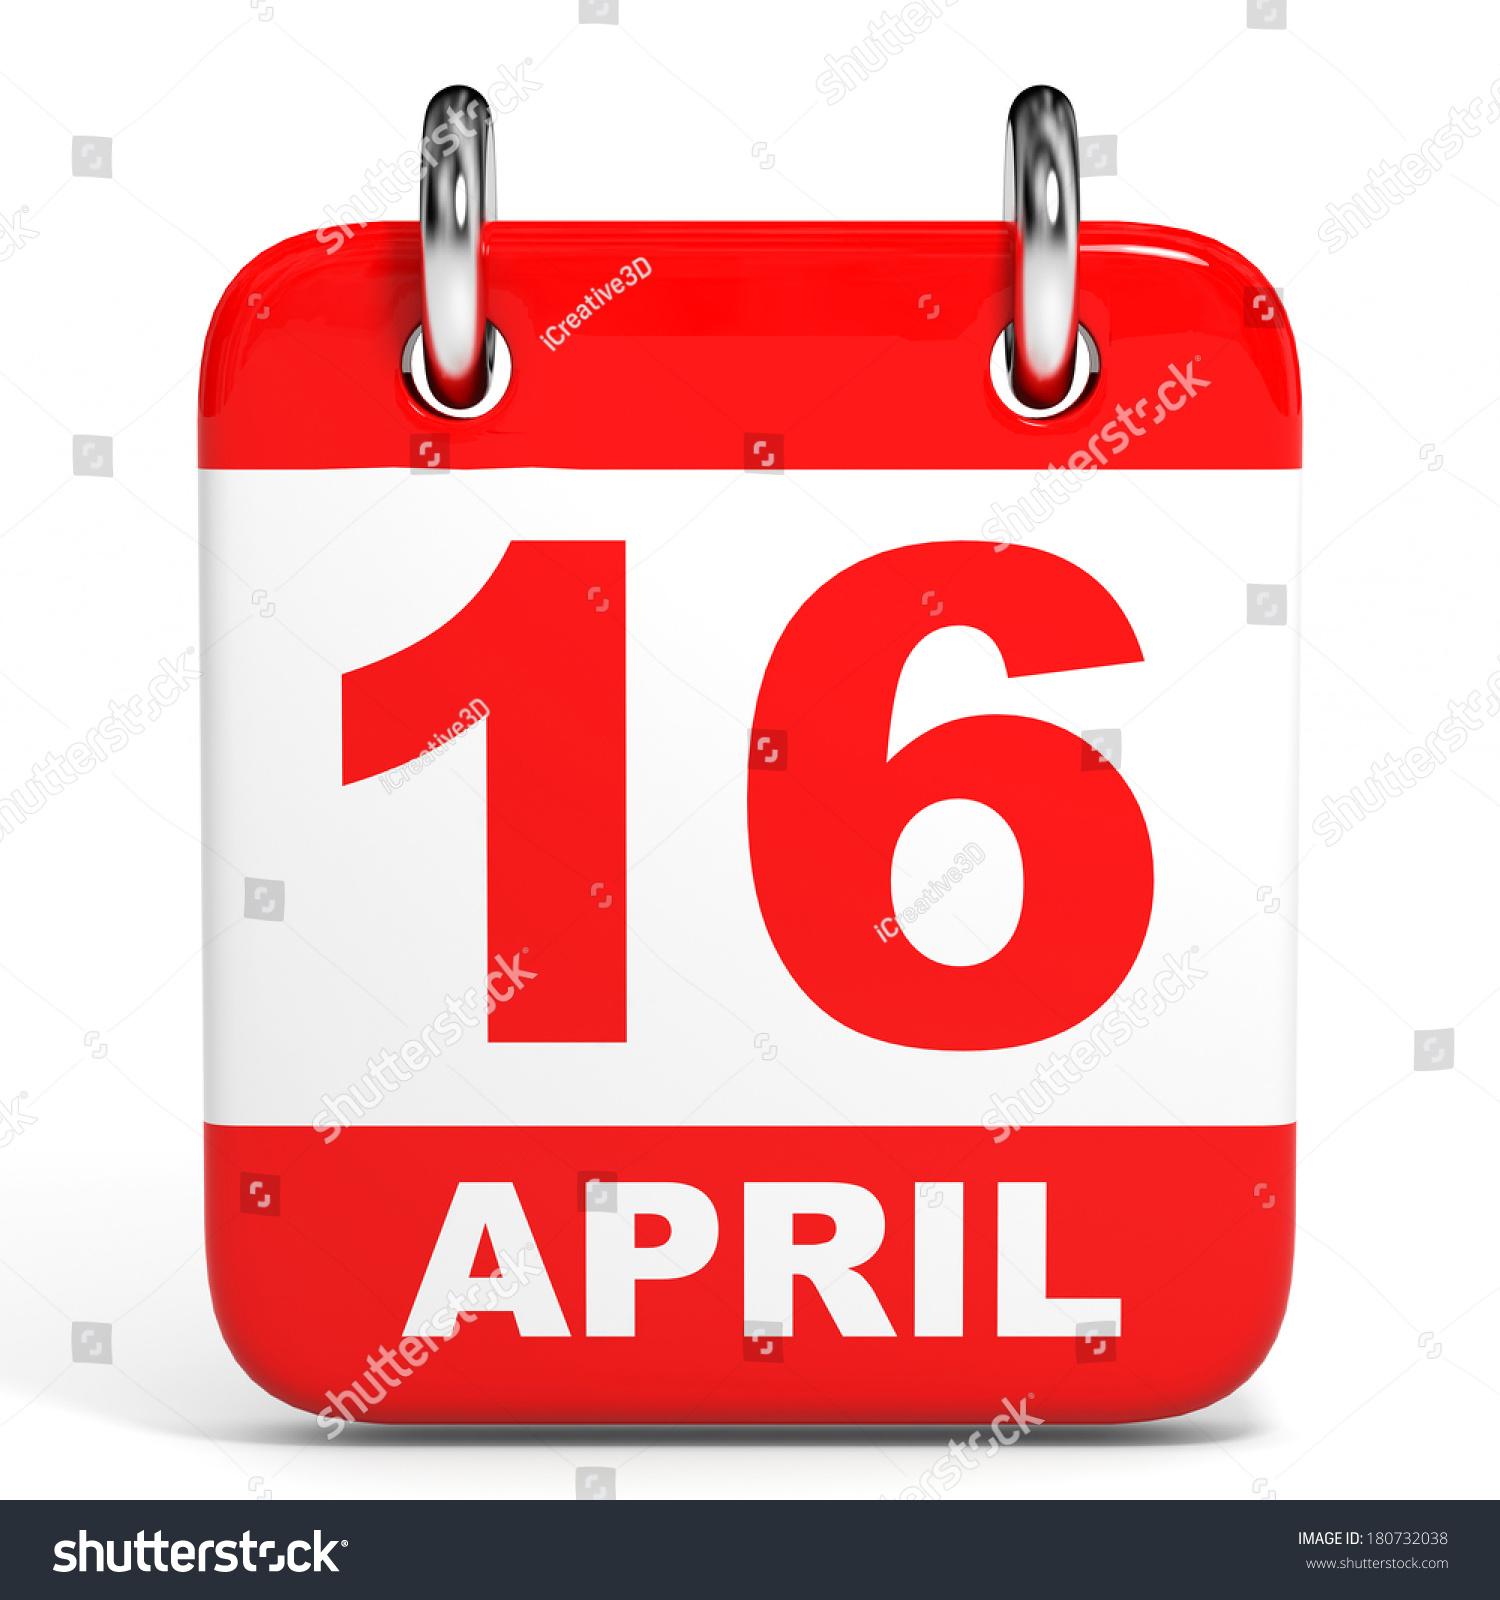 April Calendar Illustration : Calendar on white background april stock illustration